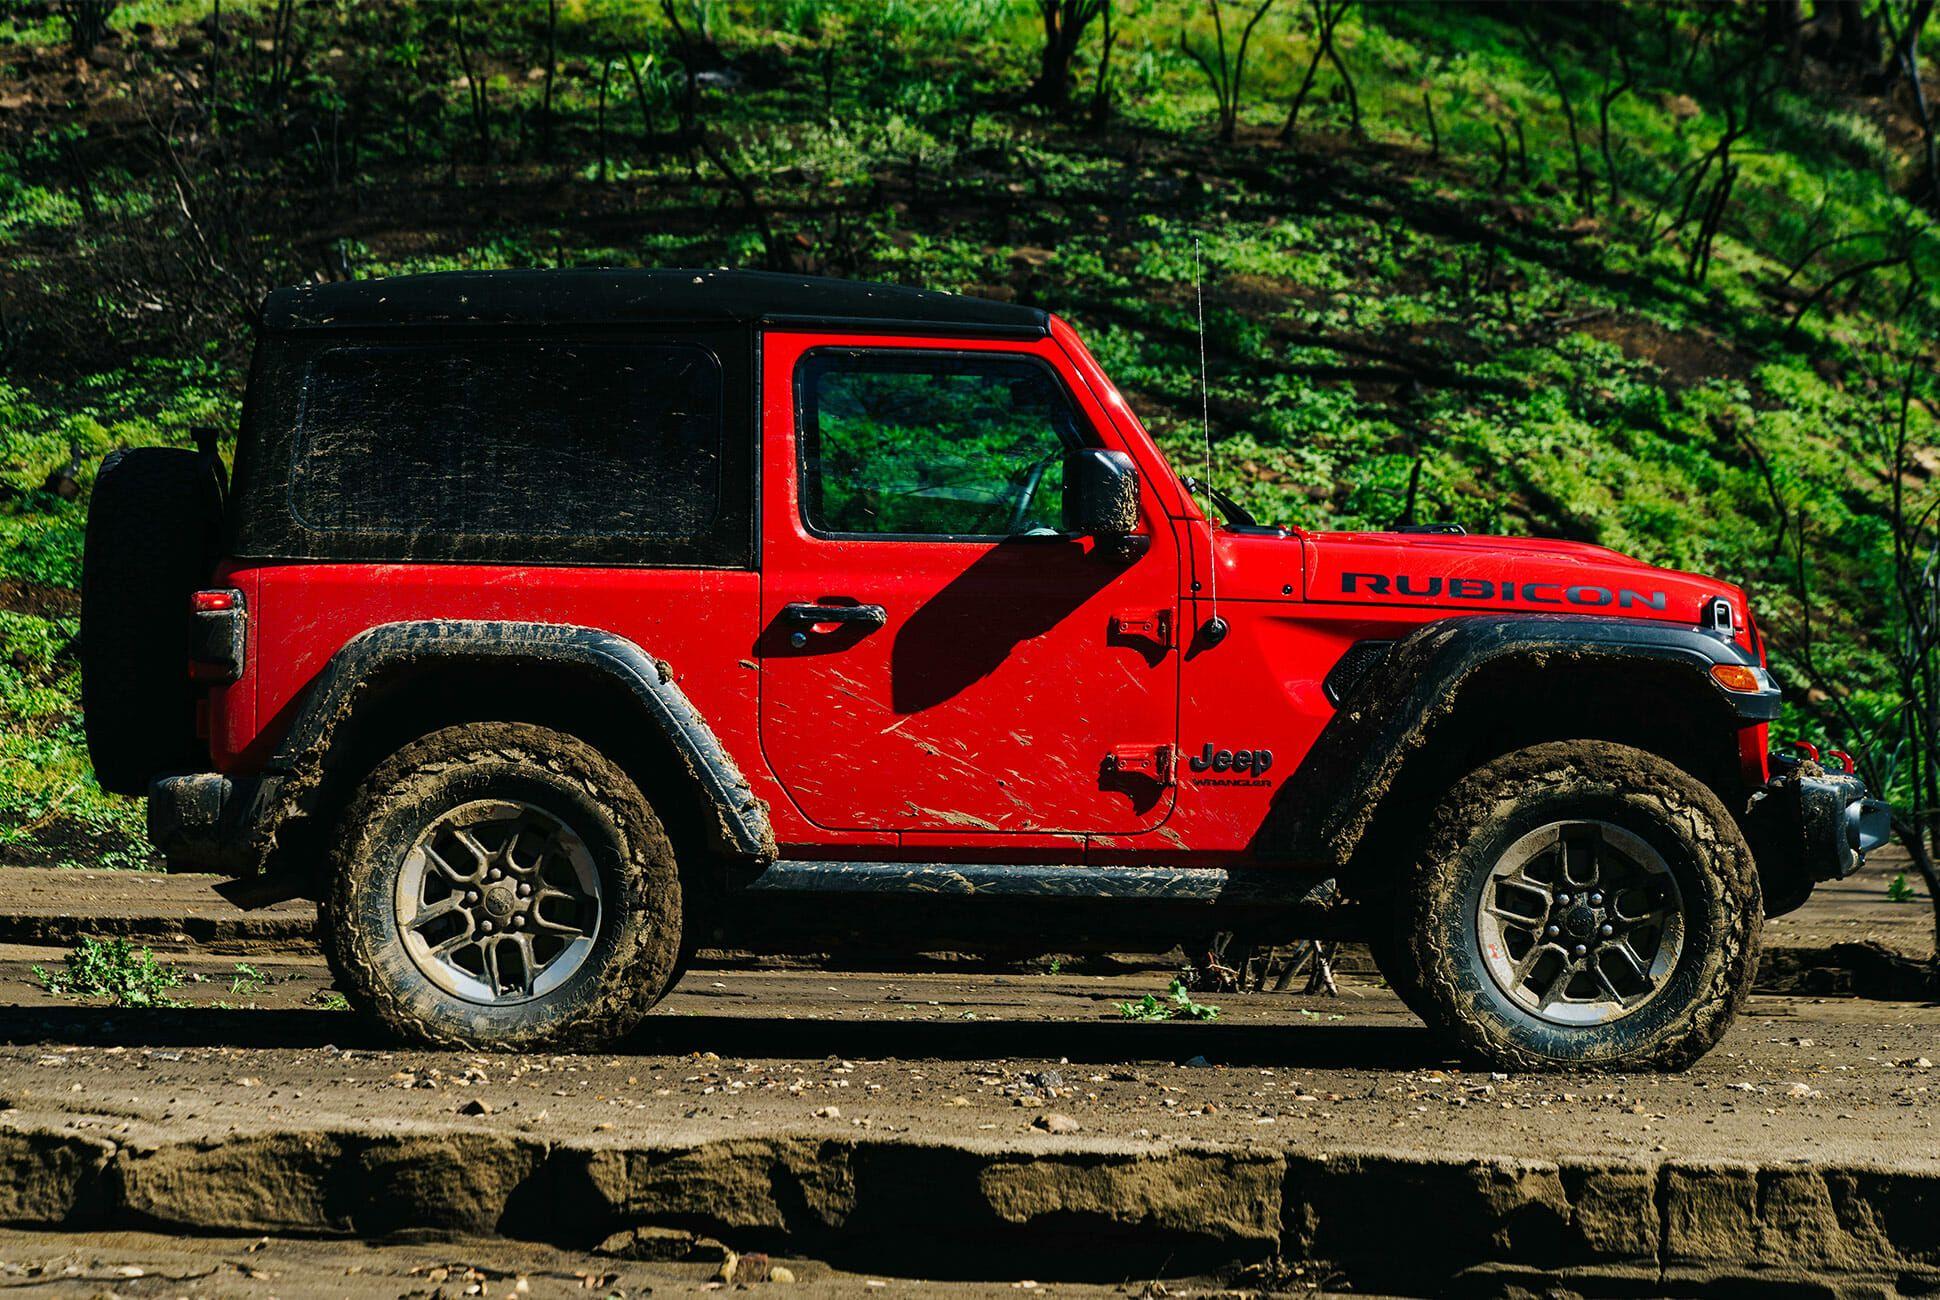 Jeep-Wrangler-2-0-Turbo-gear-patrol-slide-2